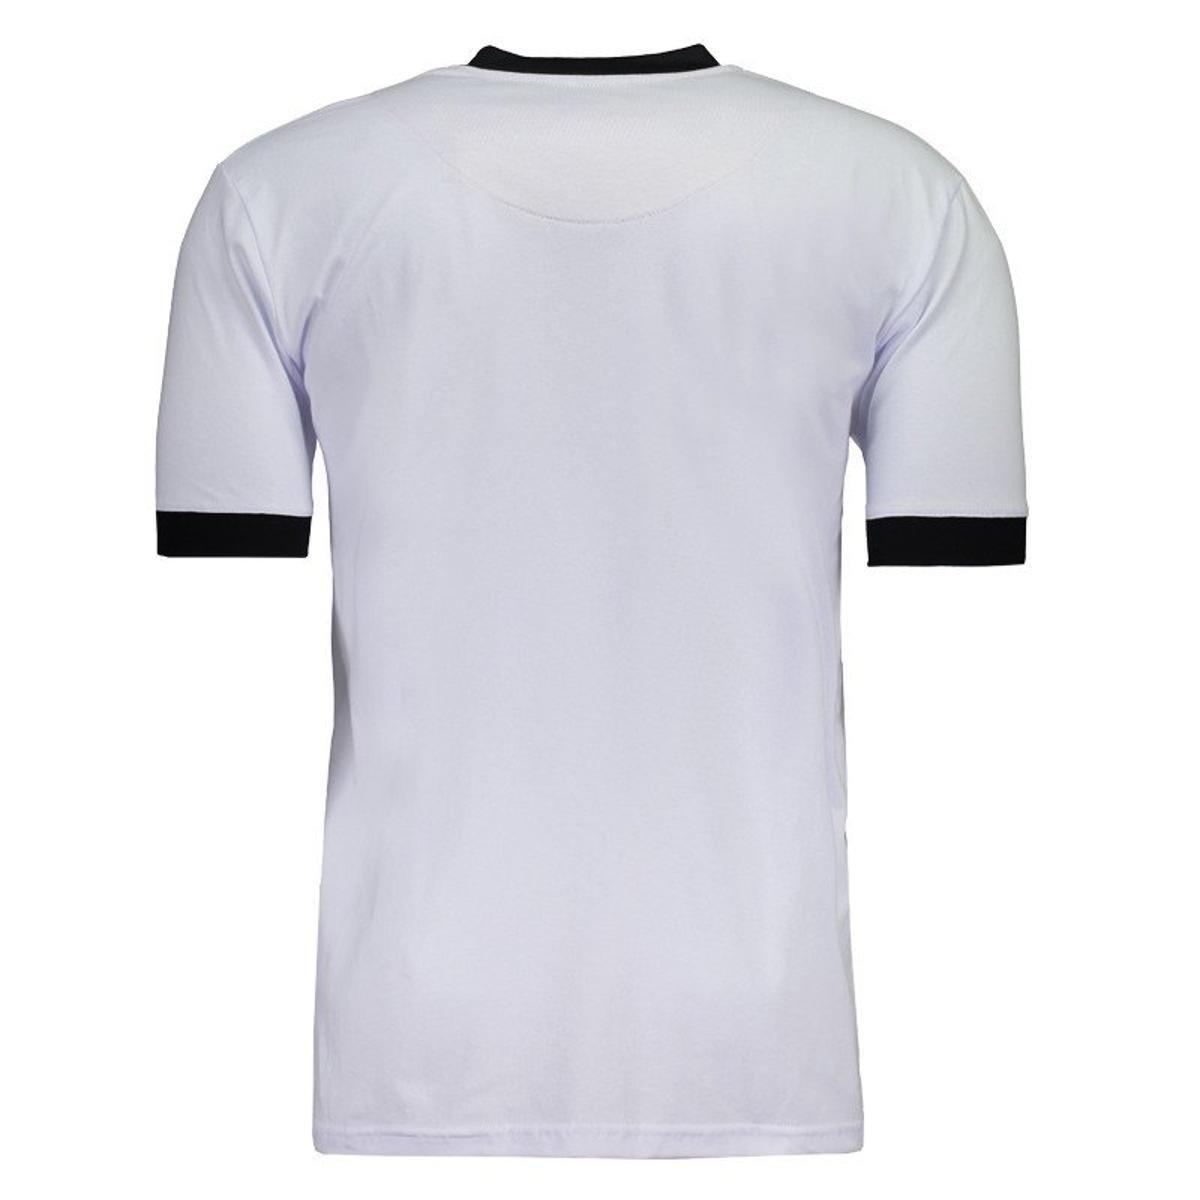 3db8f1a6ba Camisa Alemanha Ocidental Retrô 1954 Masculina - Branco - Compre ...